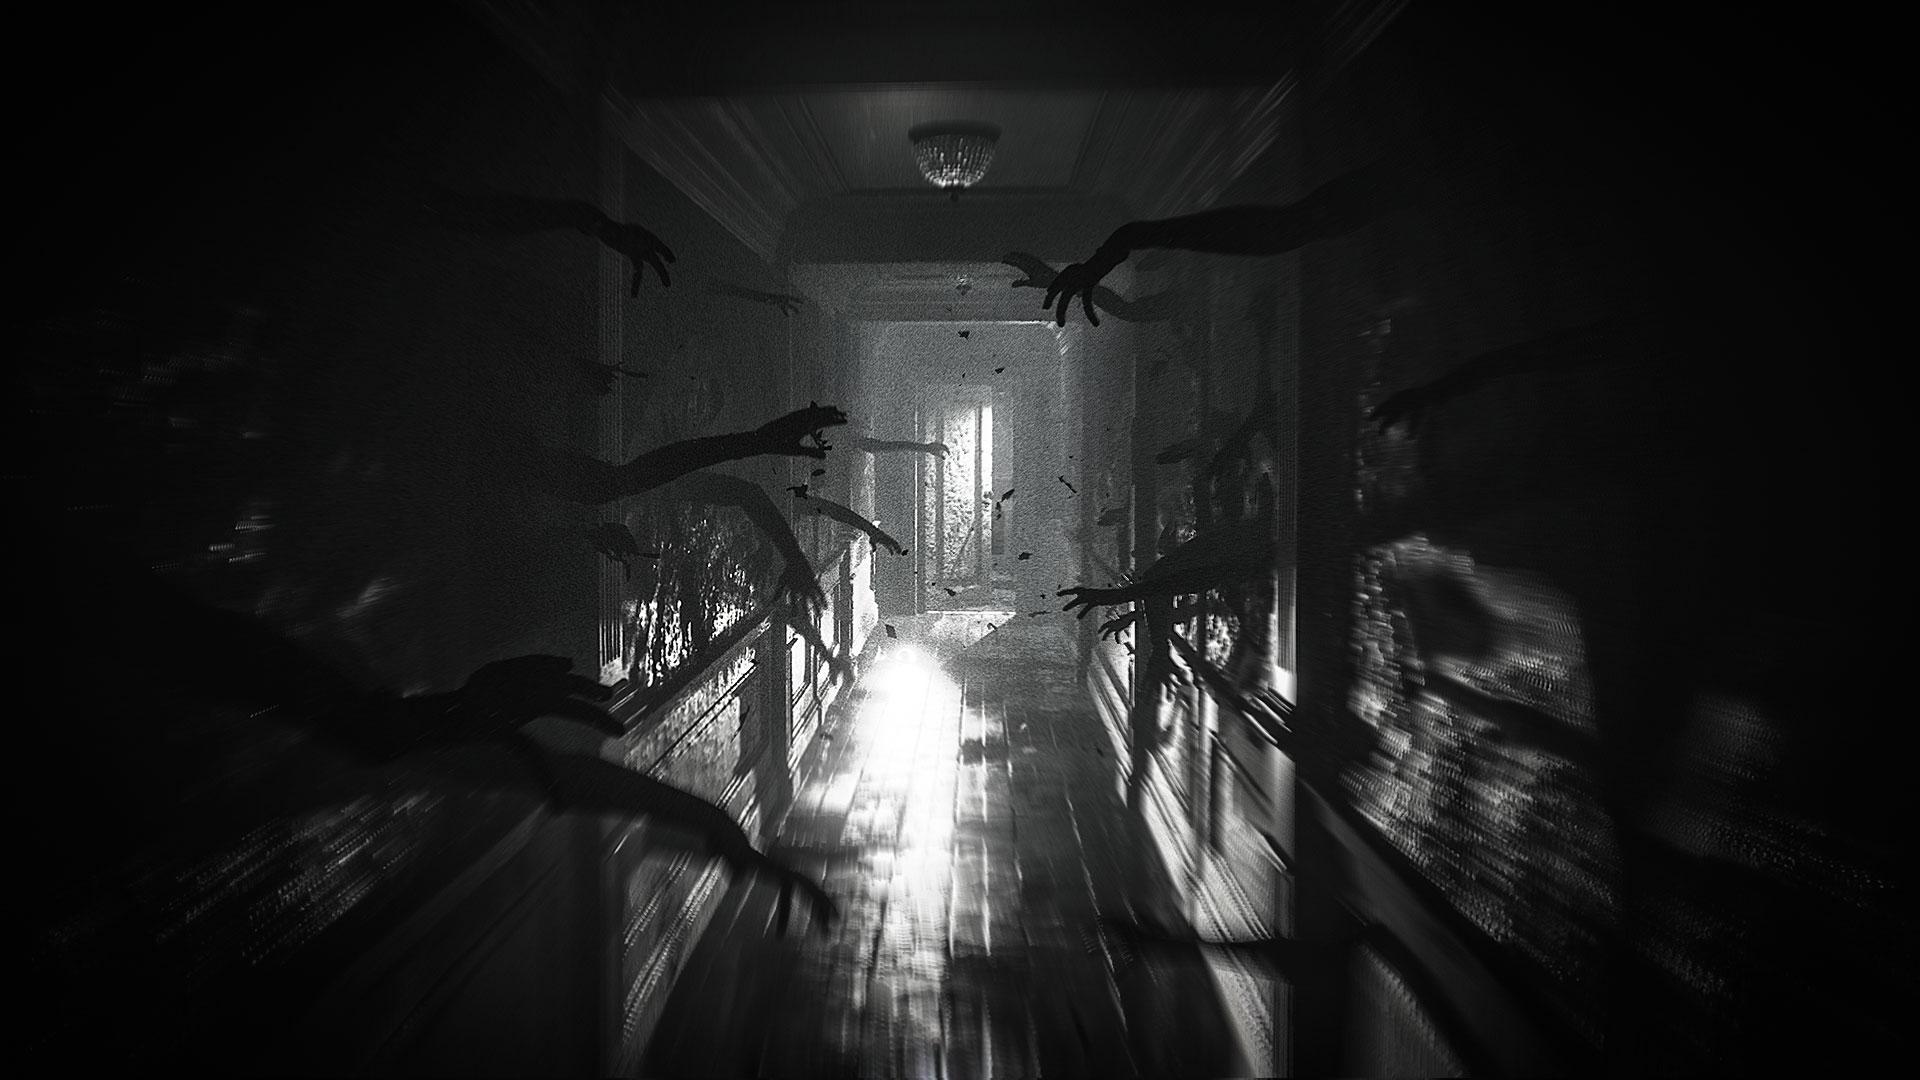 Halloween juegos - www.culturageek.com.ar